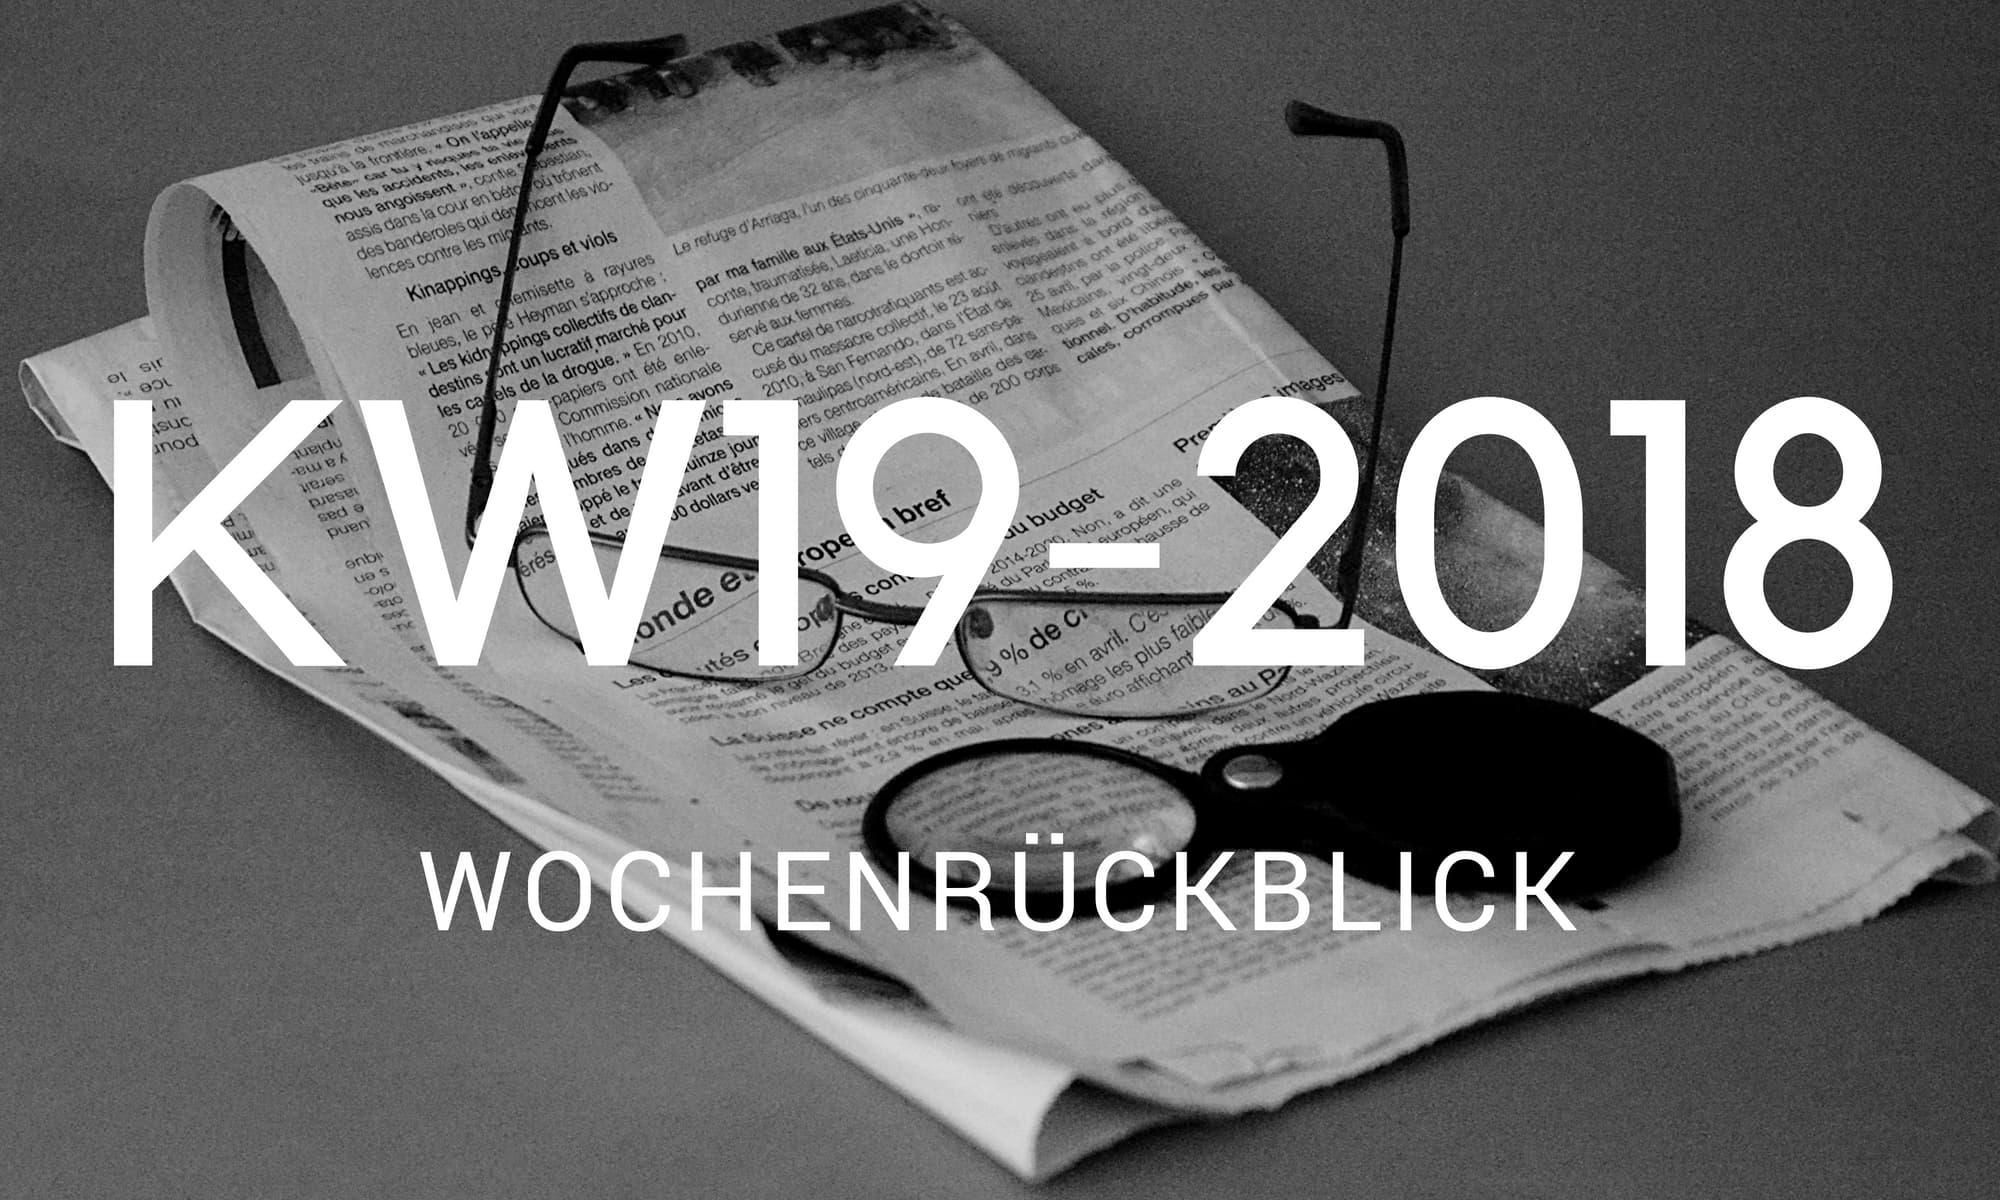 wochenrueckblick camping news KW19 2018